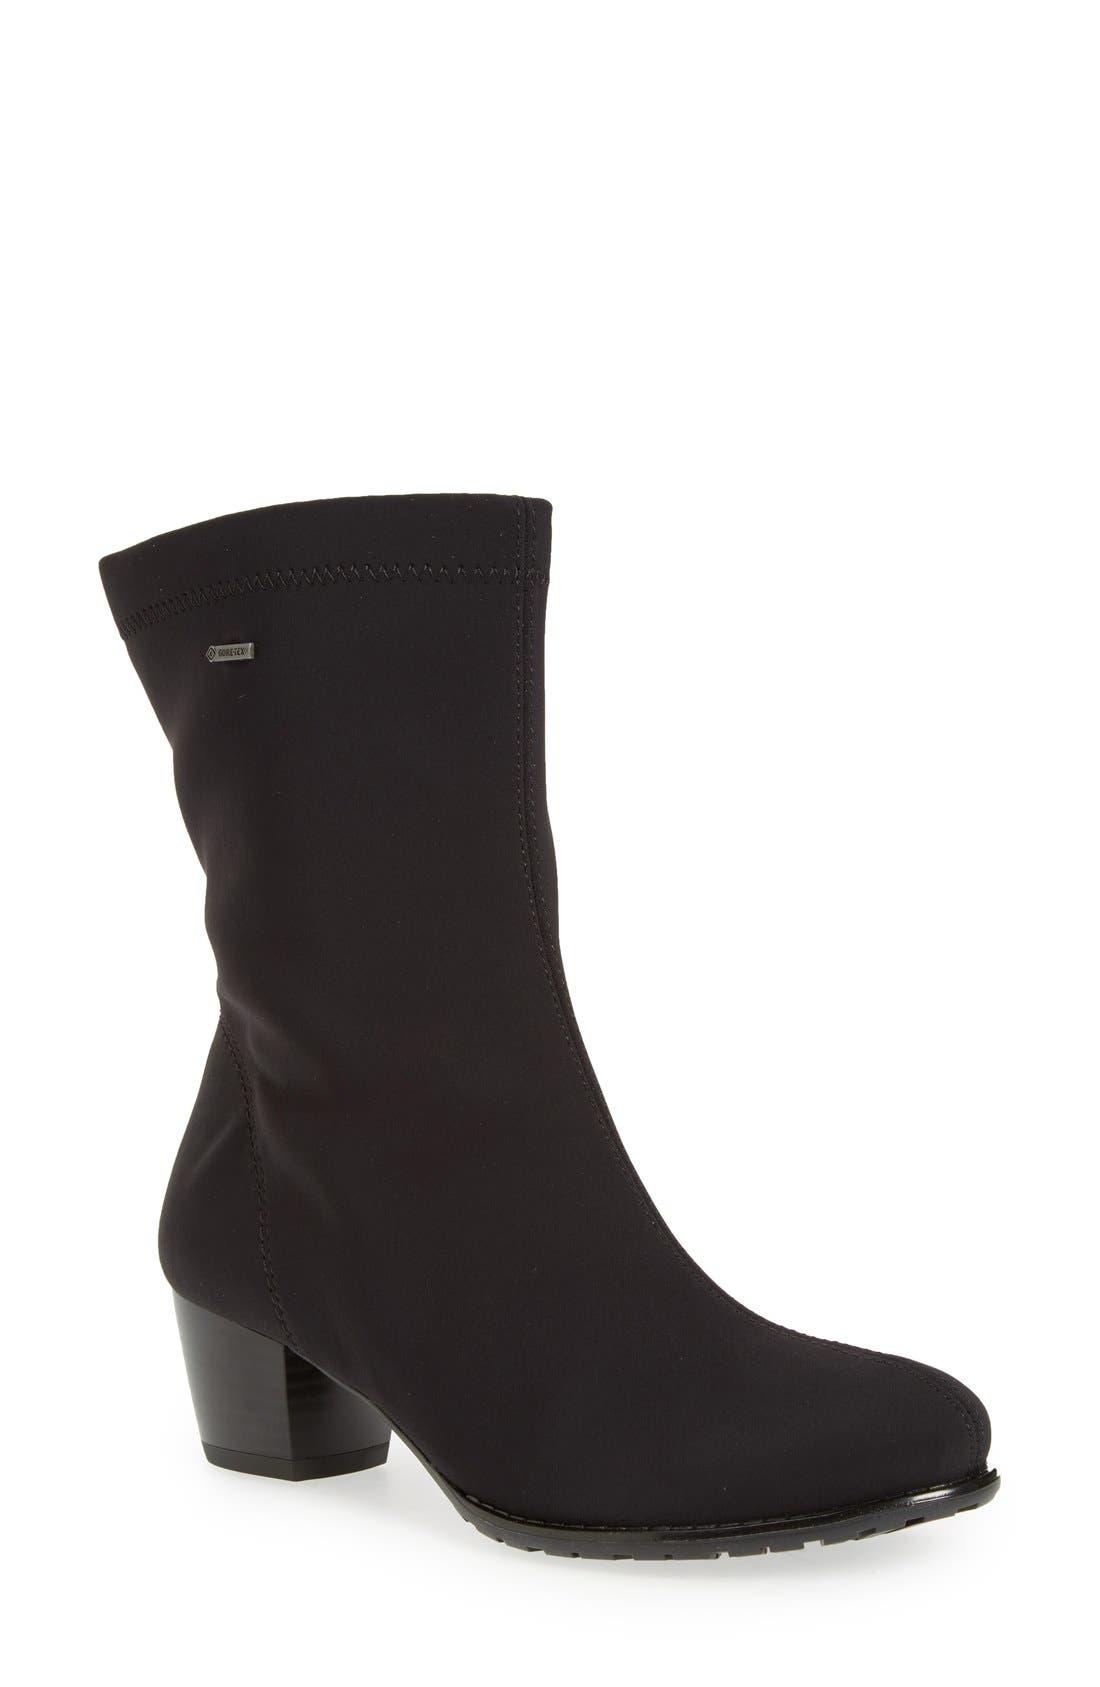 Main Image - ara 'Fairfax' Waterproof Gore-Tex® Block Heel Boot (Women)